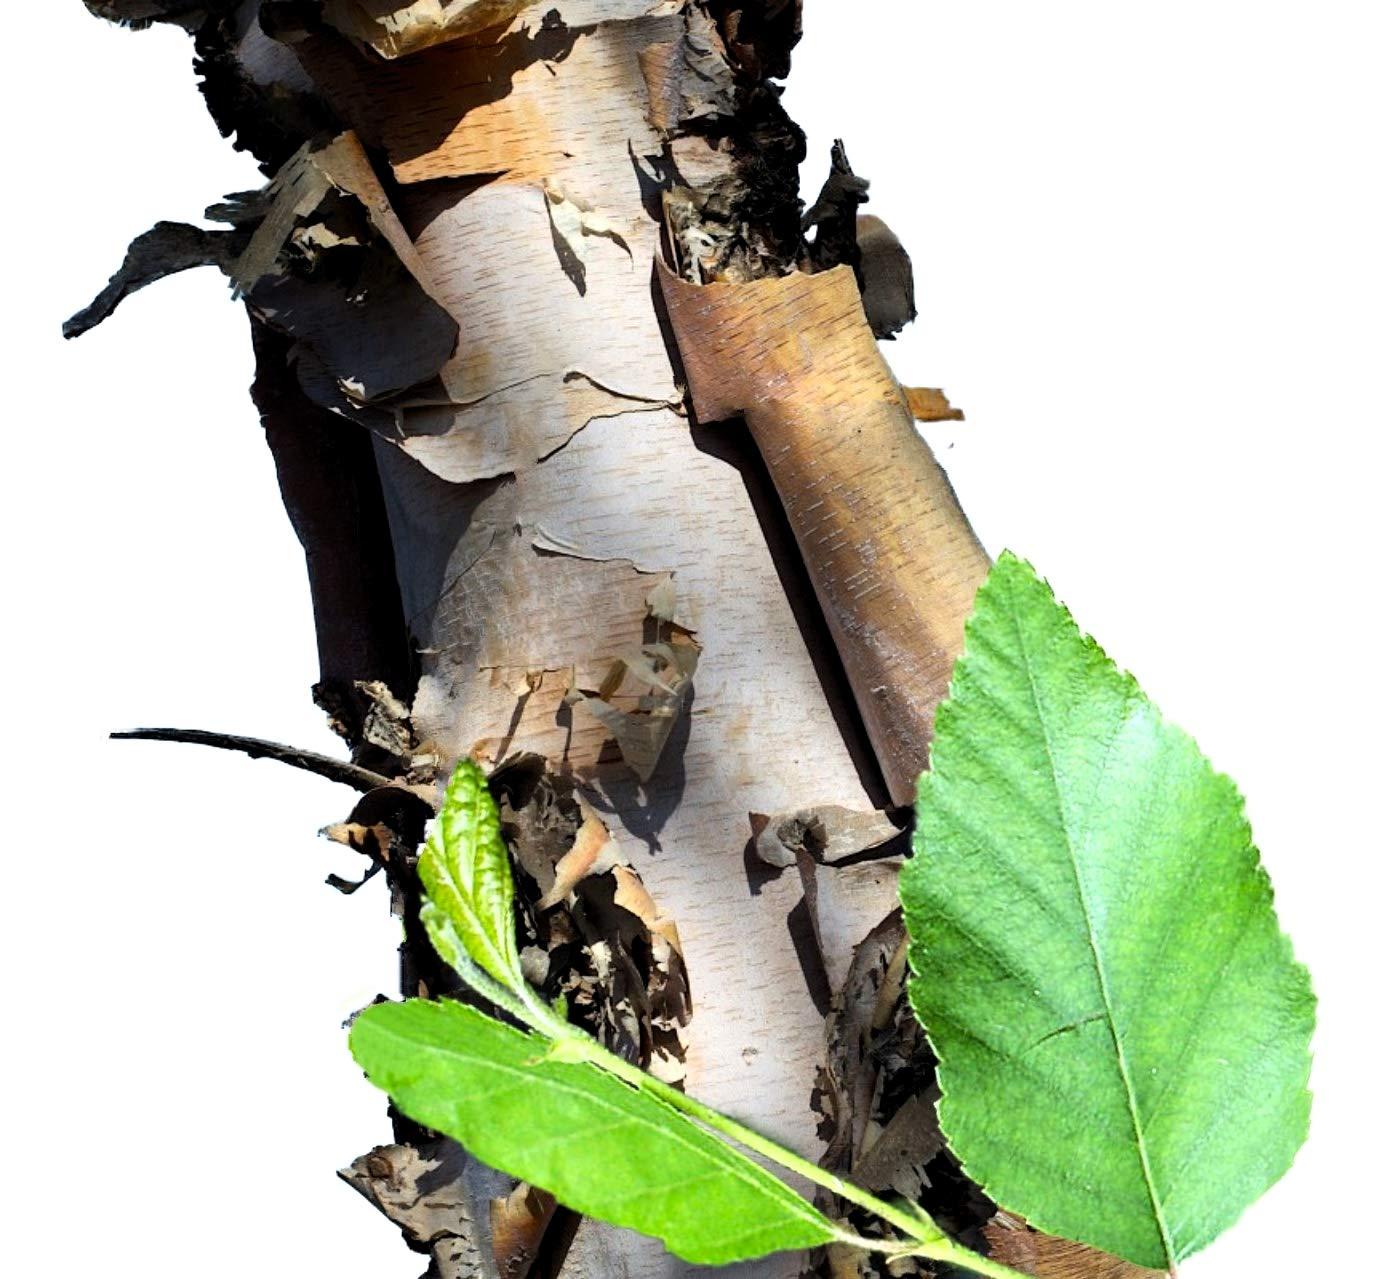 River Birch Tree - Live Plant Shipped 2 to 3 Feet Tall by DAS Farms (No California)